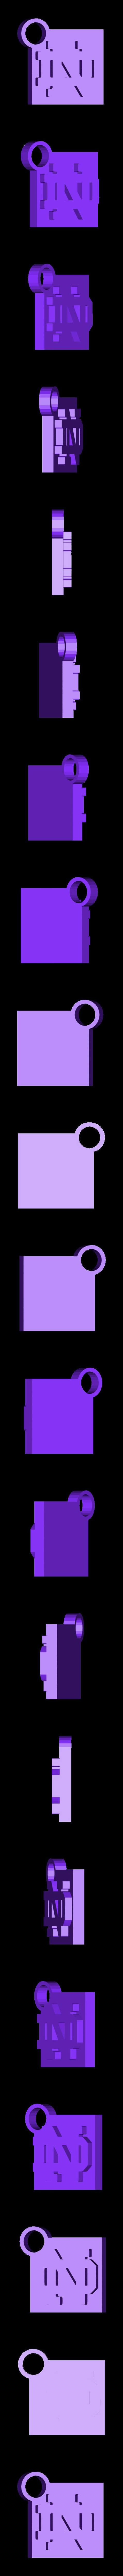 Stunning_Snaget-Rottis.stl Download free STL file Notre Dame Keychain • 3D printer template, 3DPrintingGurus